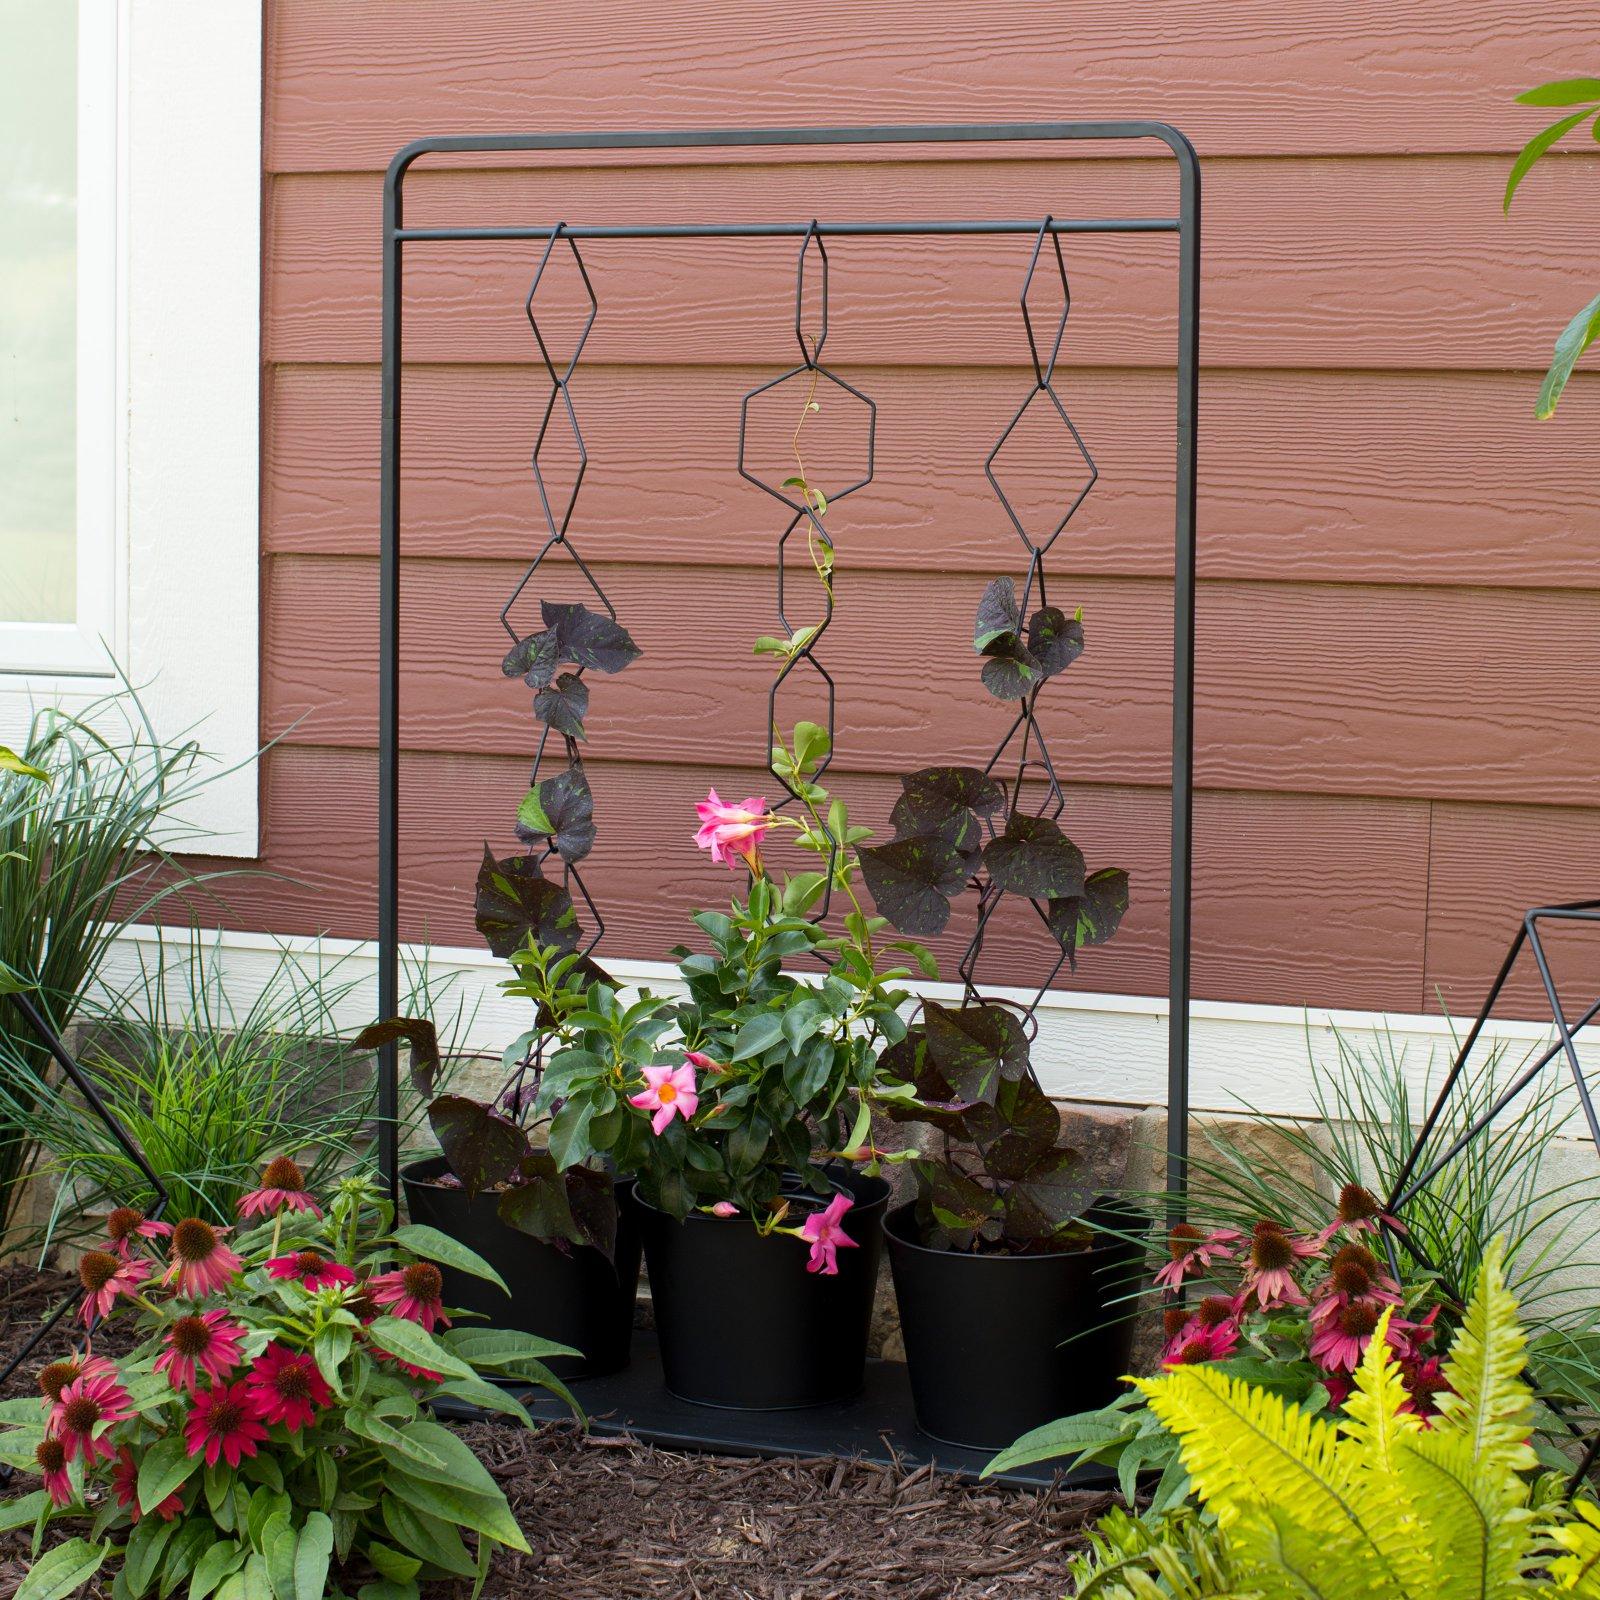 Belham Living Aldrich Container Garden with Hanging Trellis by 4 Seasons Global Inc